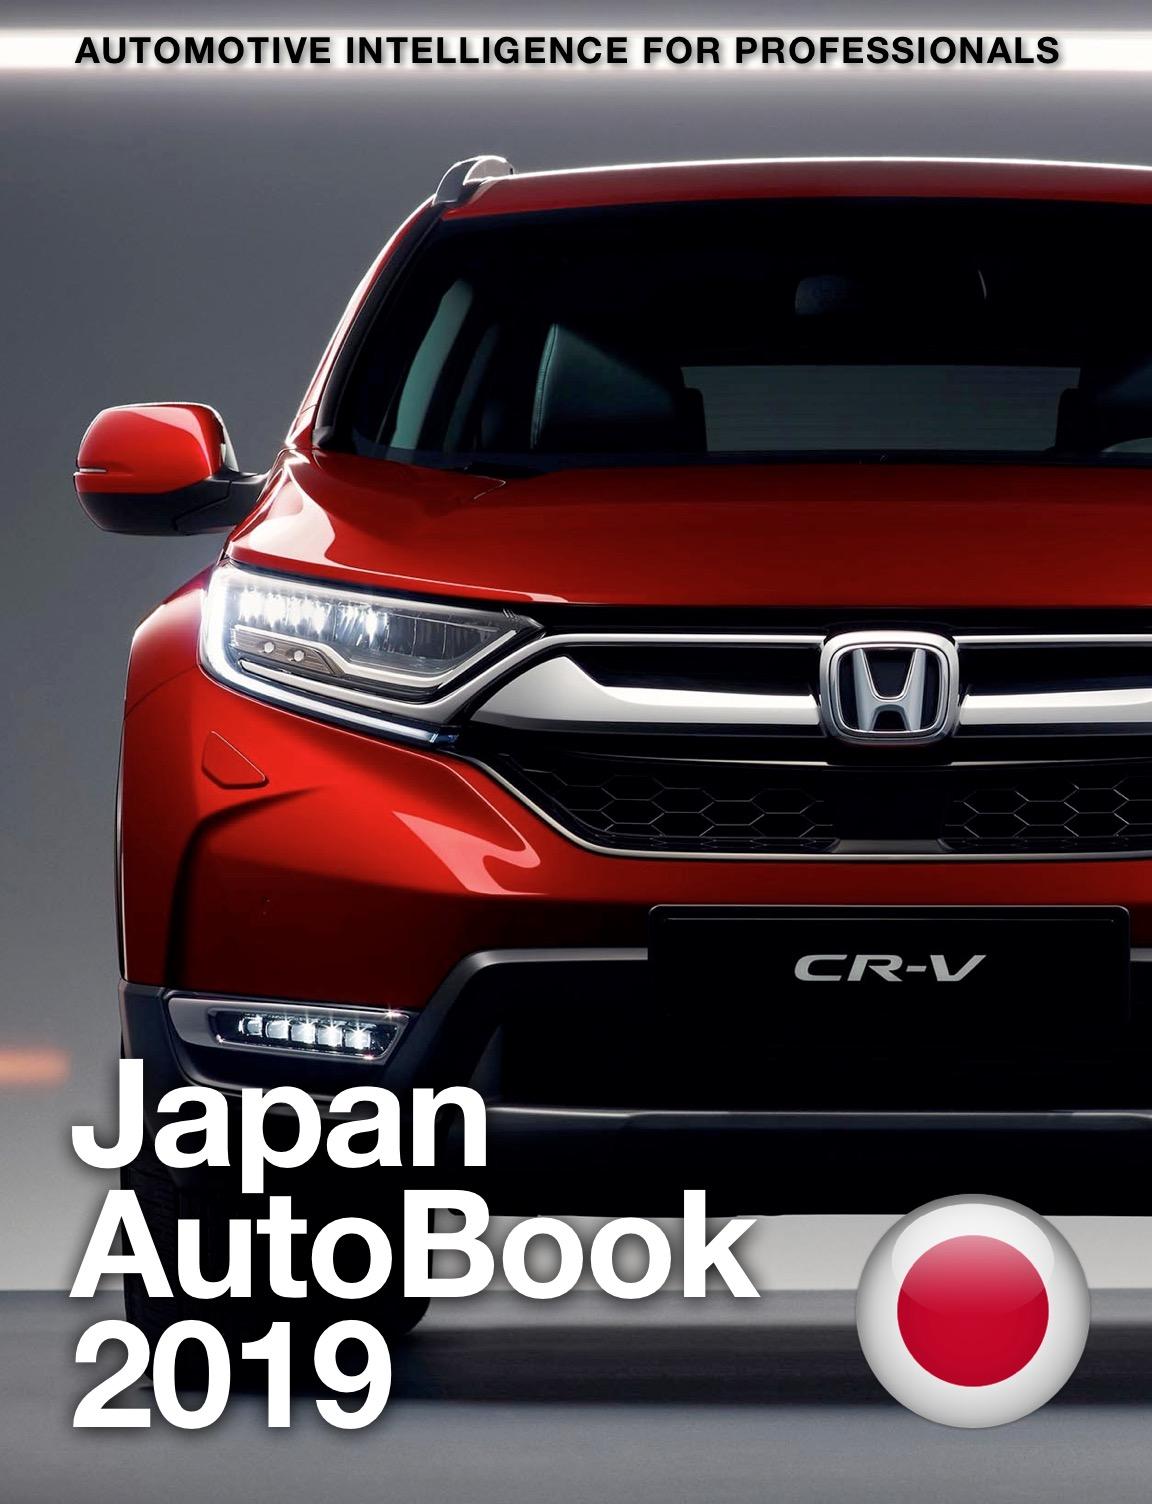 Japan AutoBook 2019 Cover.jpg